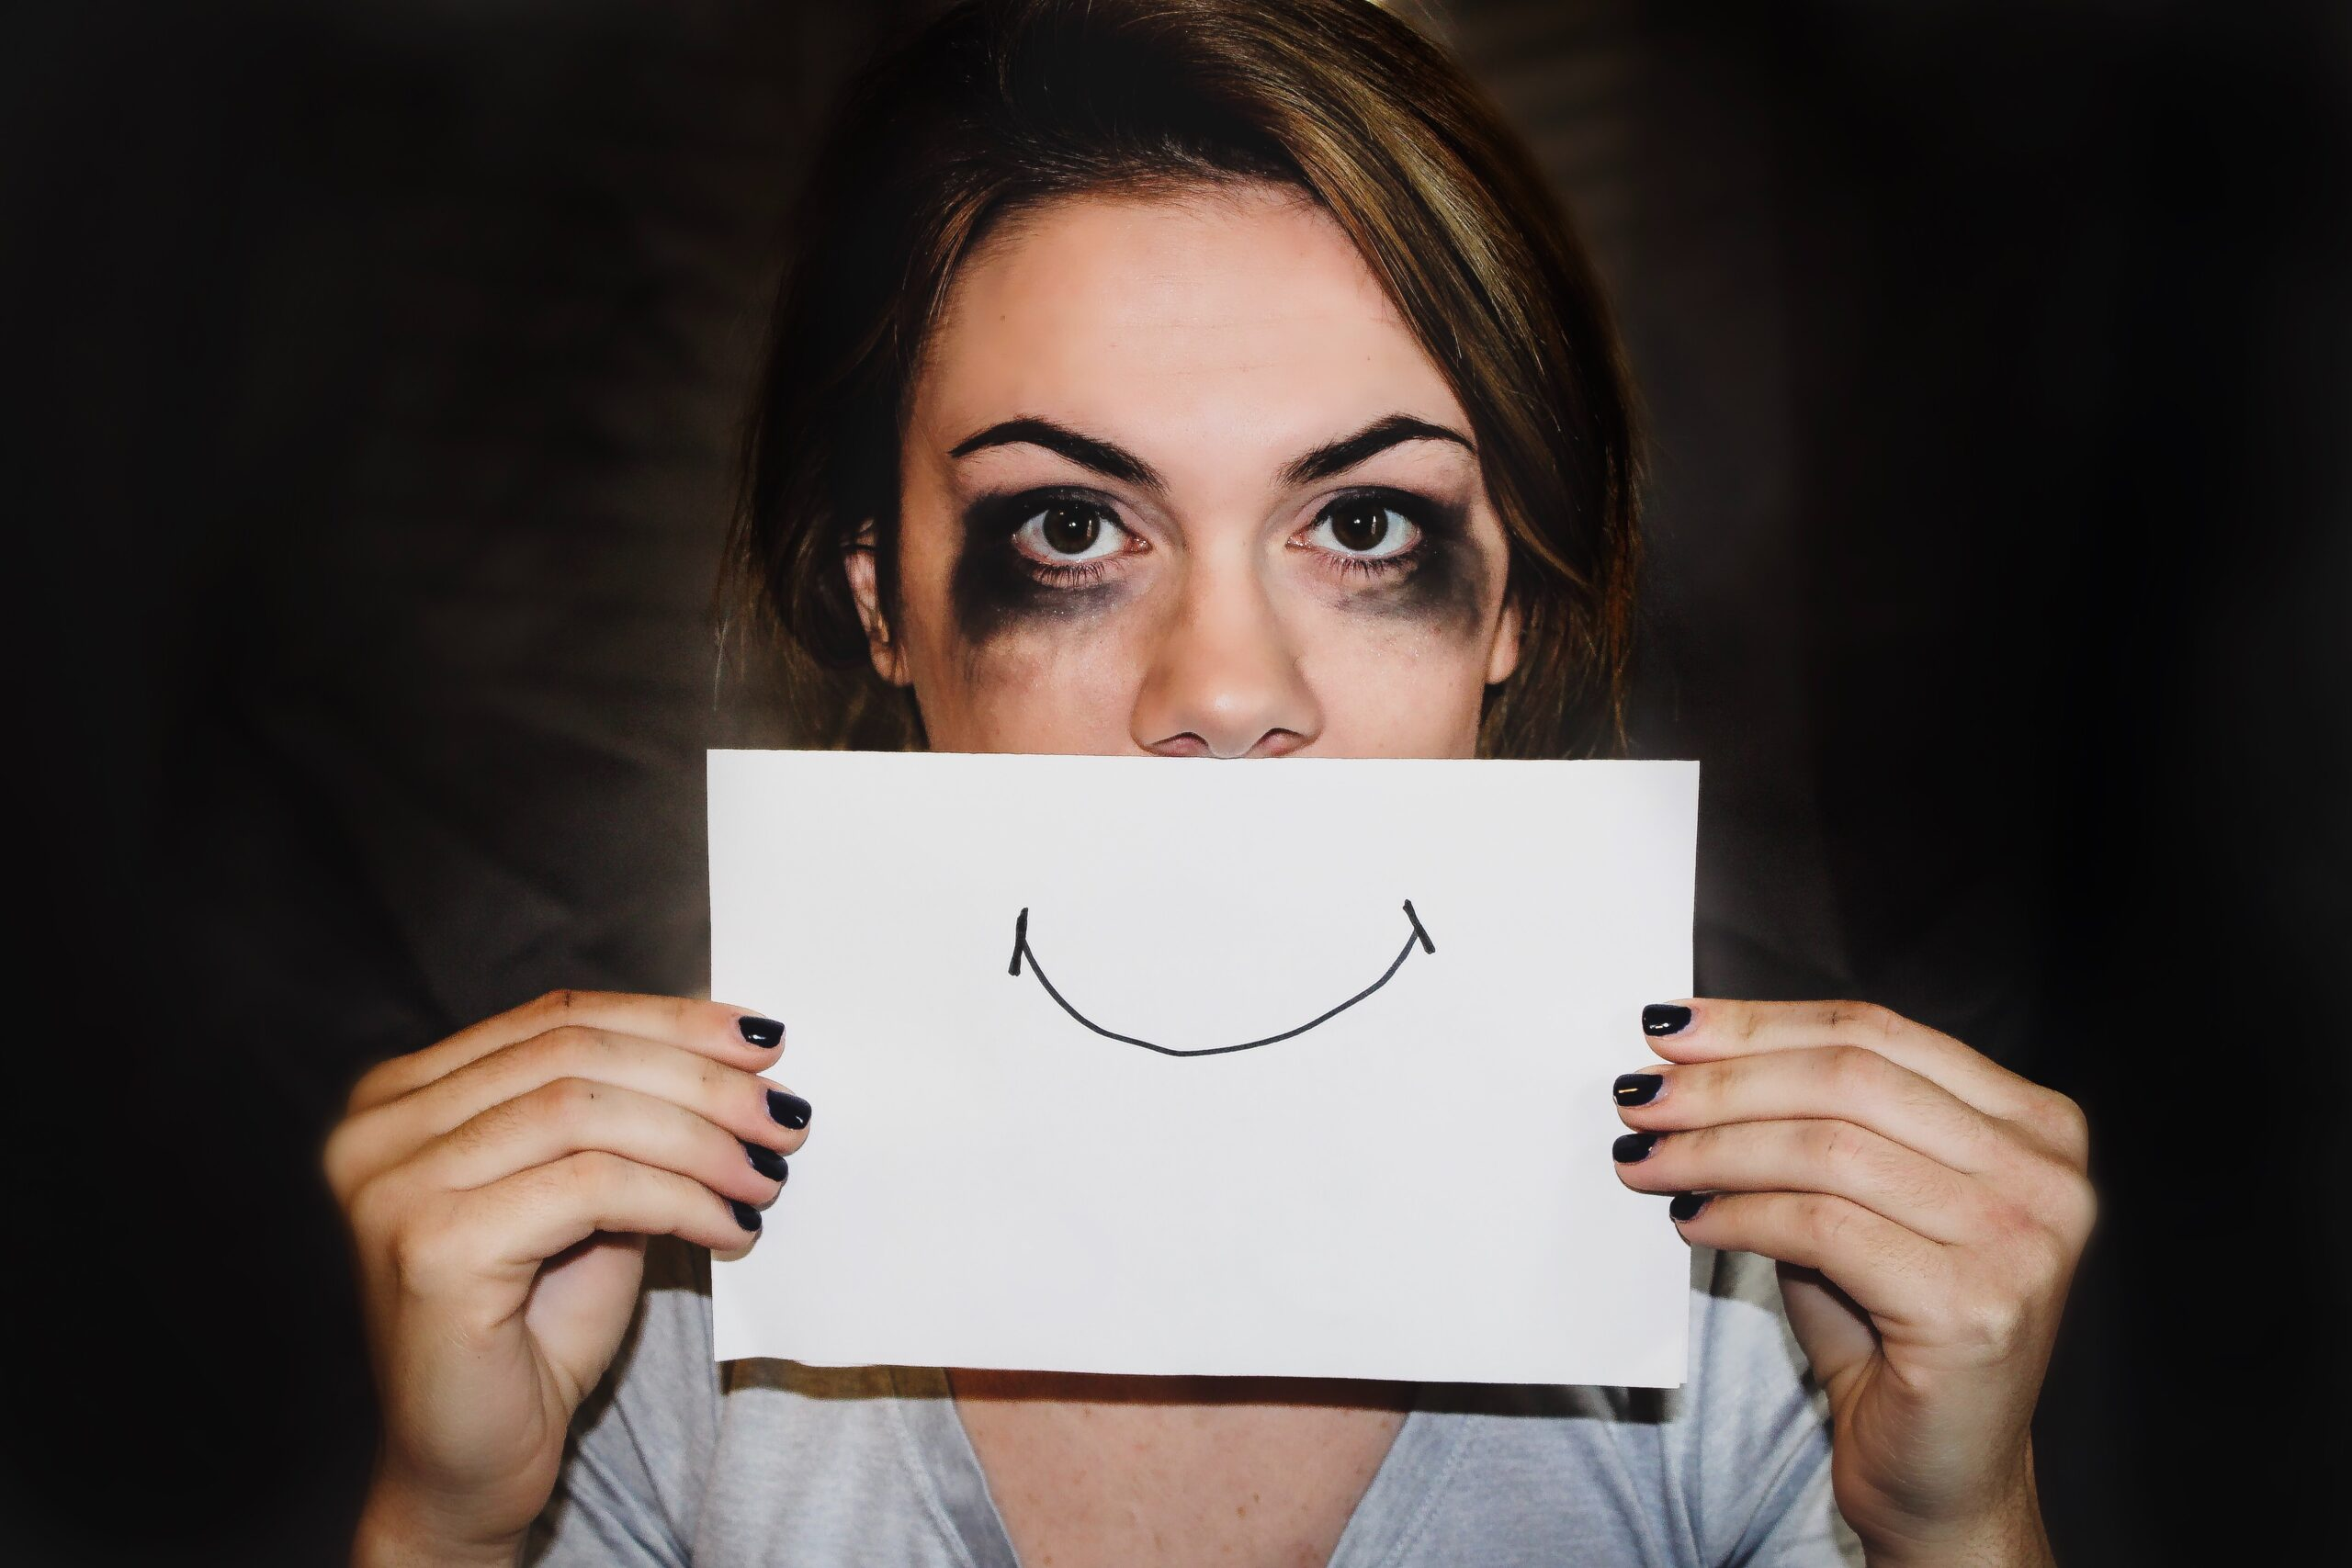 Workplace Wellness. Mental Health Matters.